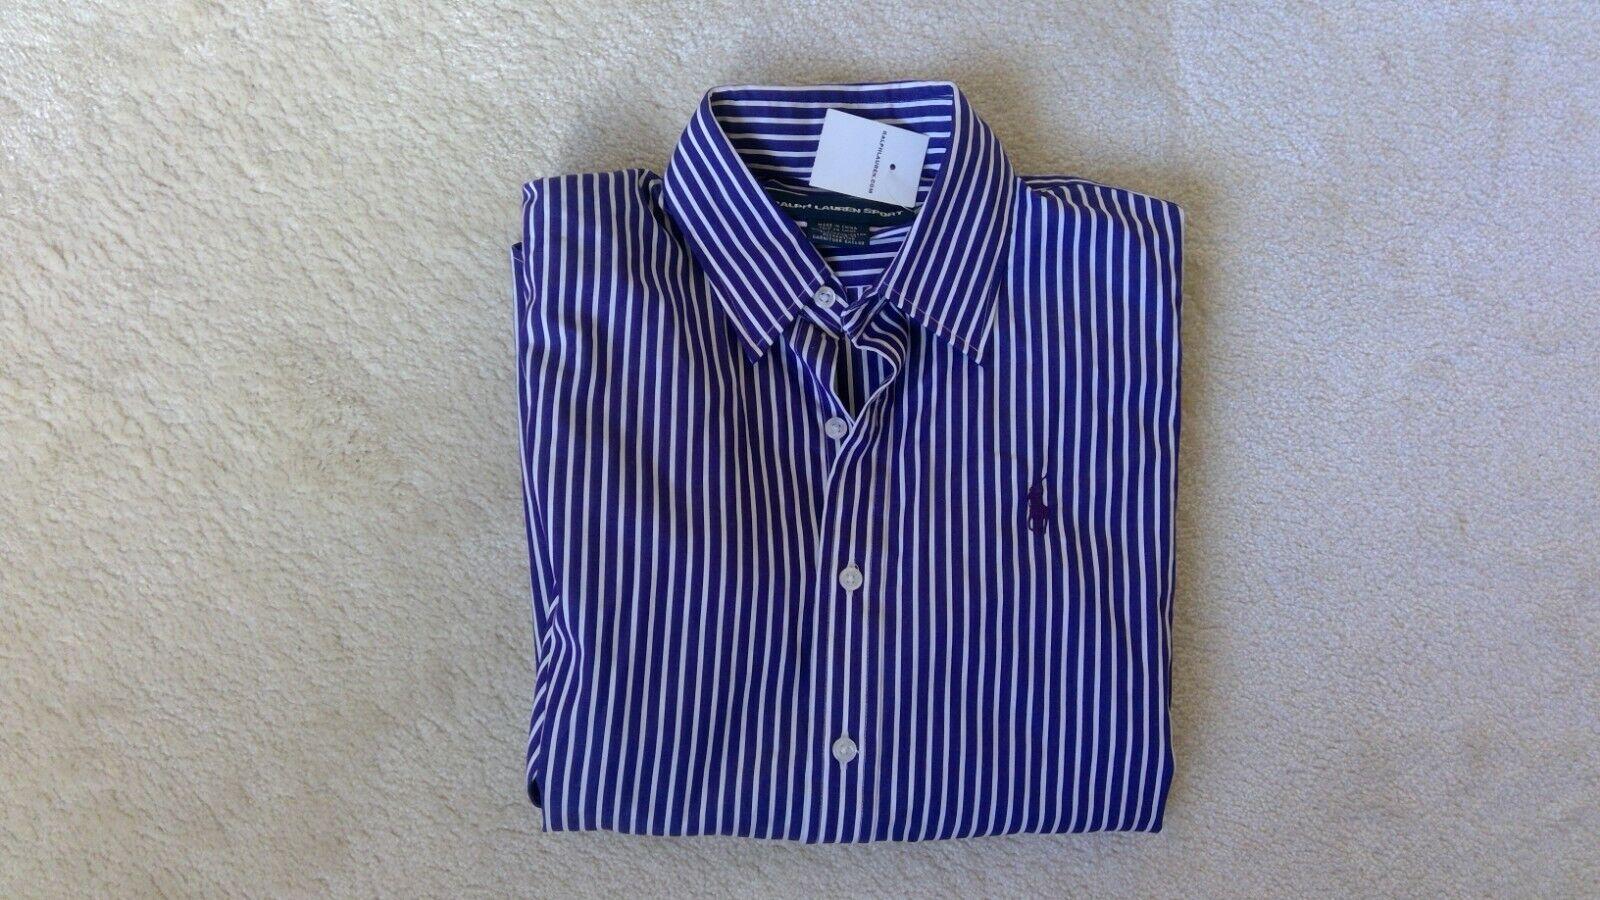 Ralph Lauren Shirt - Dark Purple & White Stripes - Size 10 - Brand new with tags